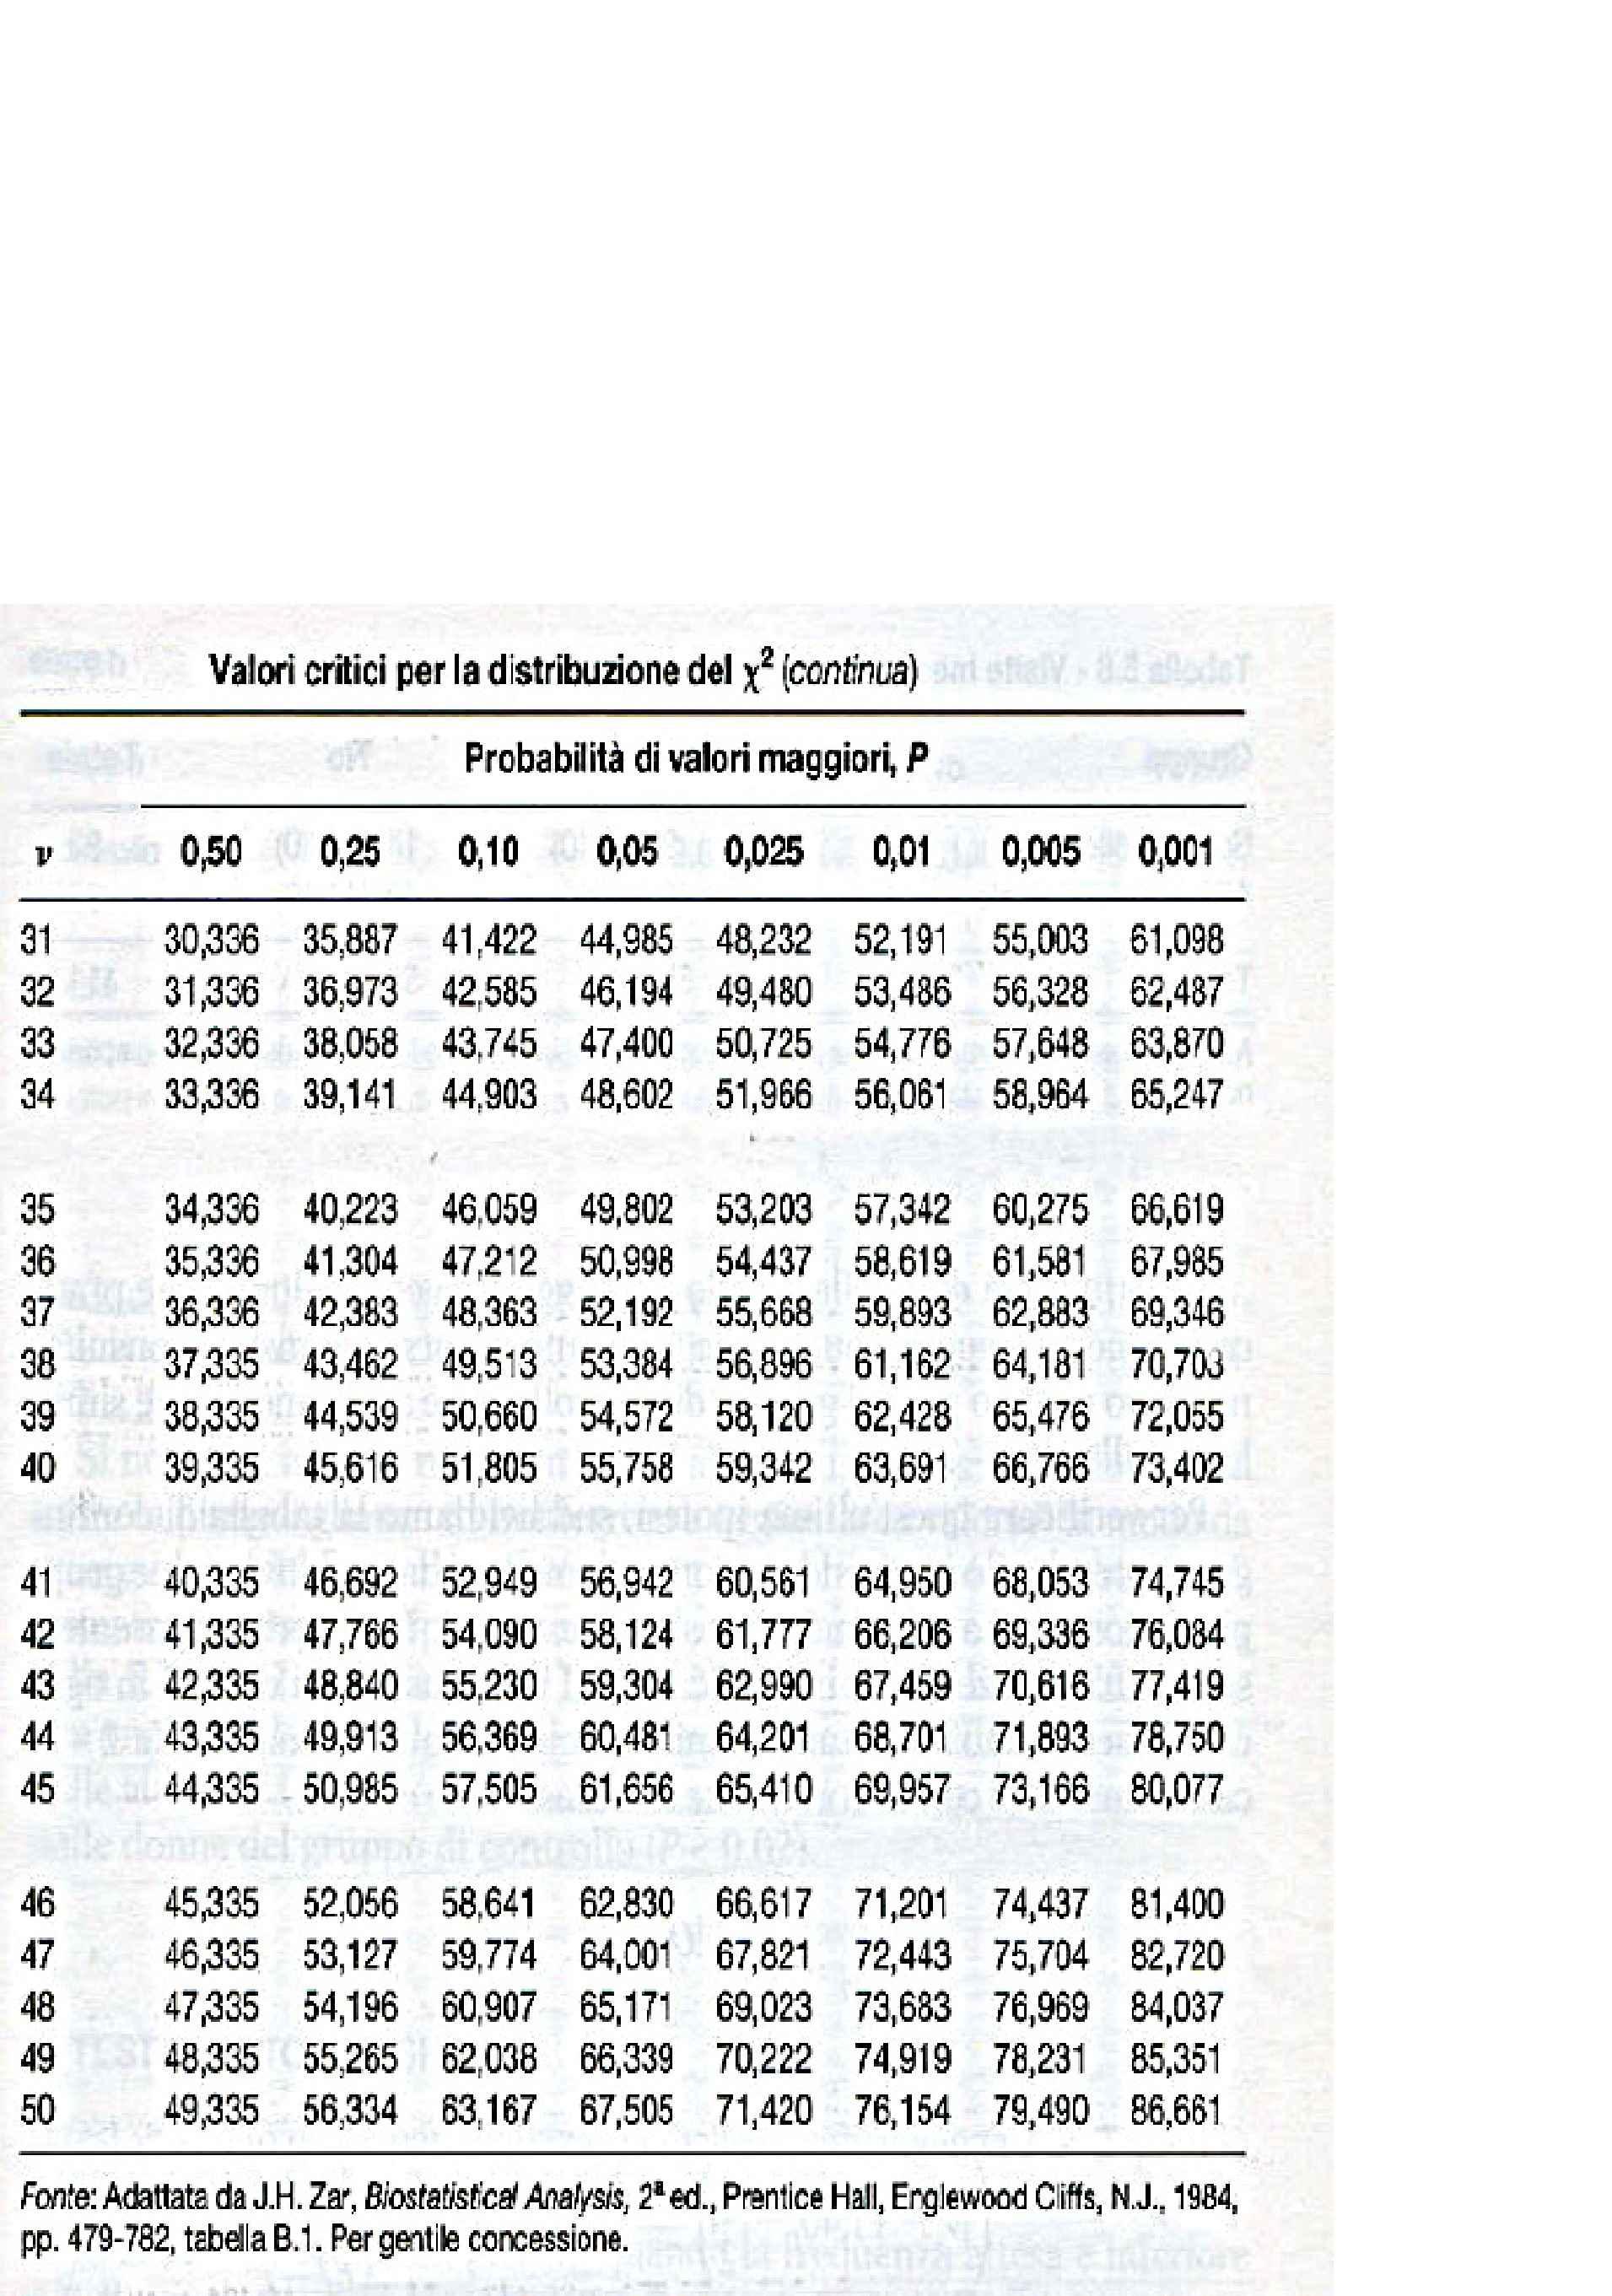 dispensa D. Cocca Statistica Medica